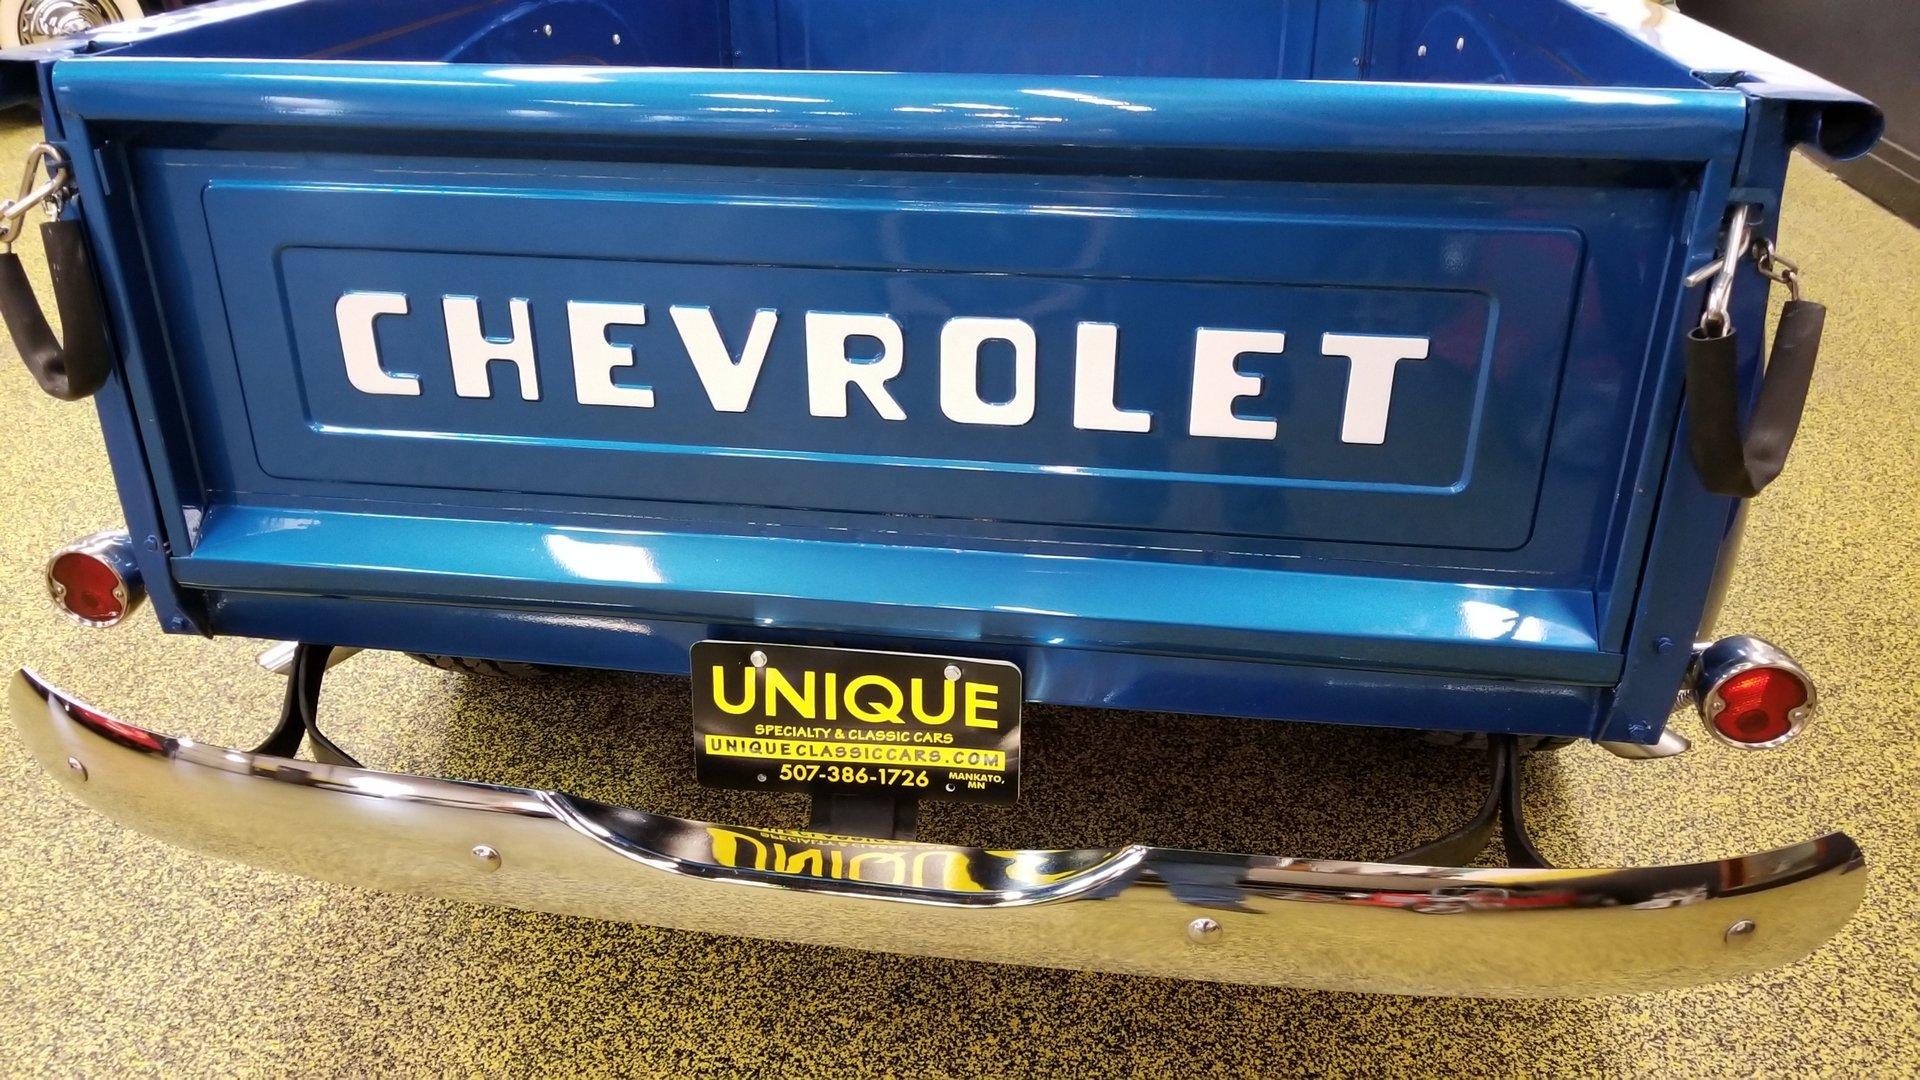 1954 Chevrolet 3100 5 Window Pickup For Sale 106509 Mcg Truck